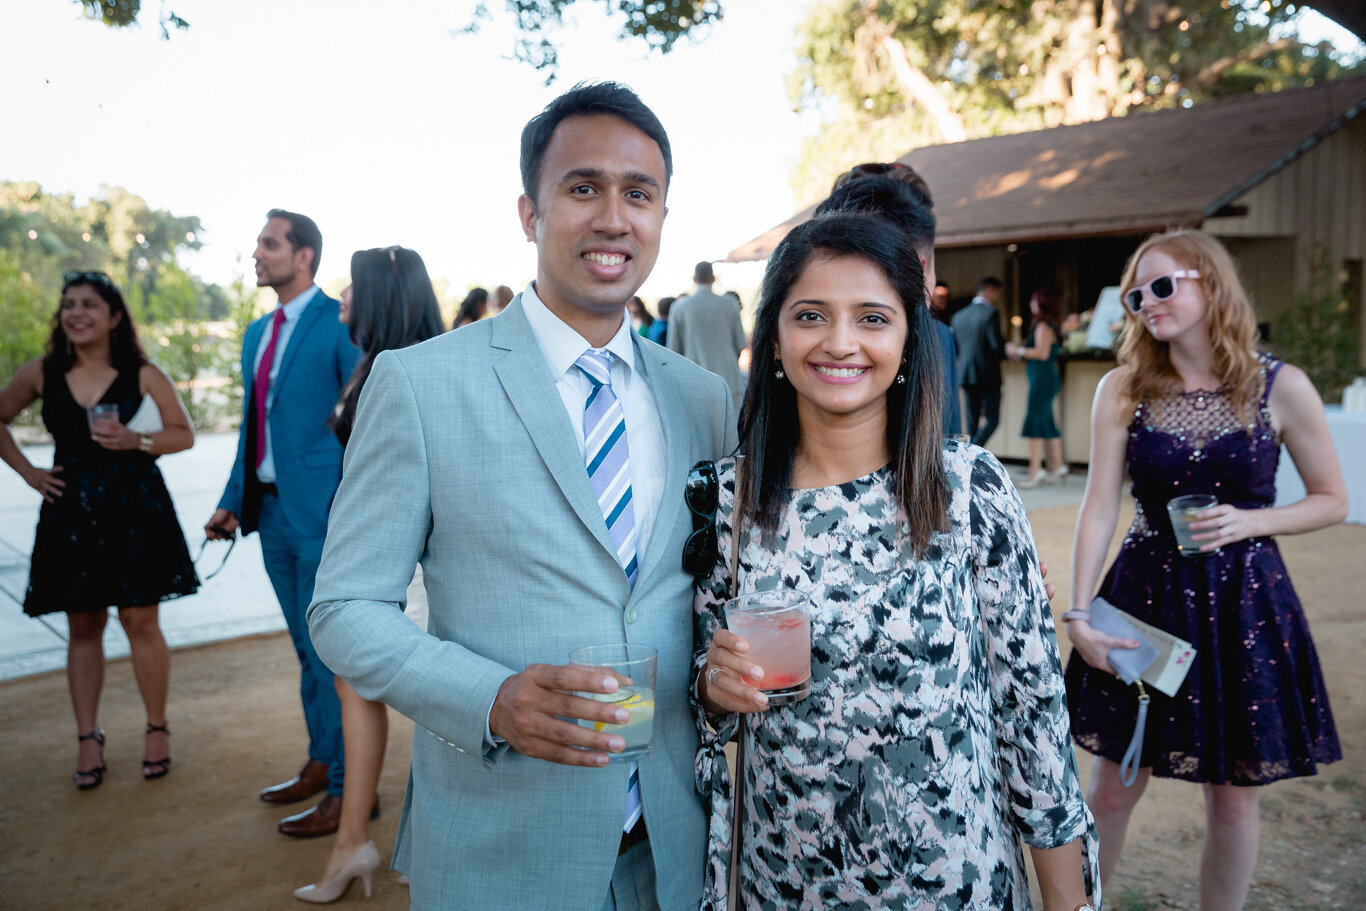 2019.08.24_Emily-Ashir-Wedding-at-the-Maples-6126.jpg